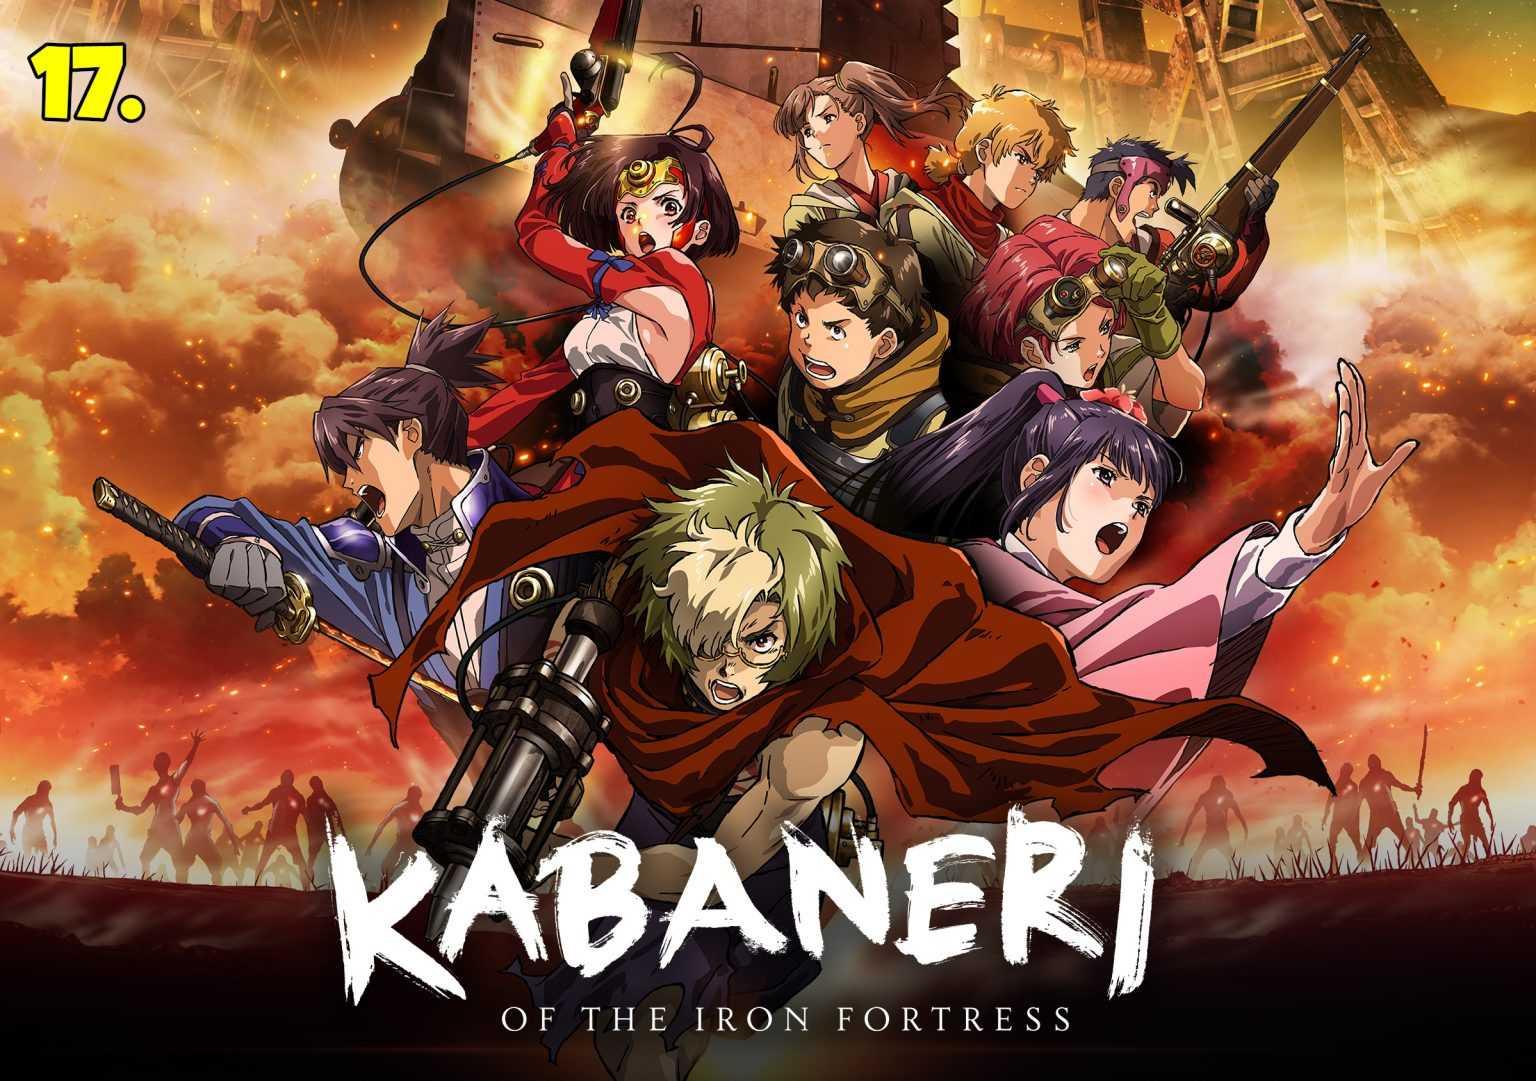 Kabaneri-of-the-Iron-Fortress